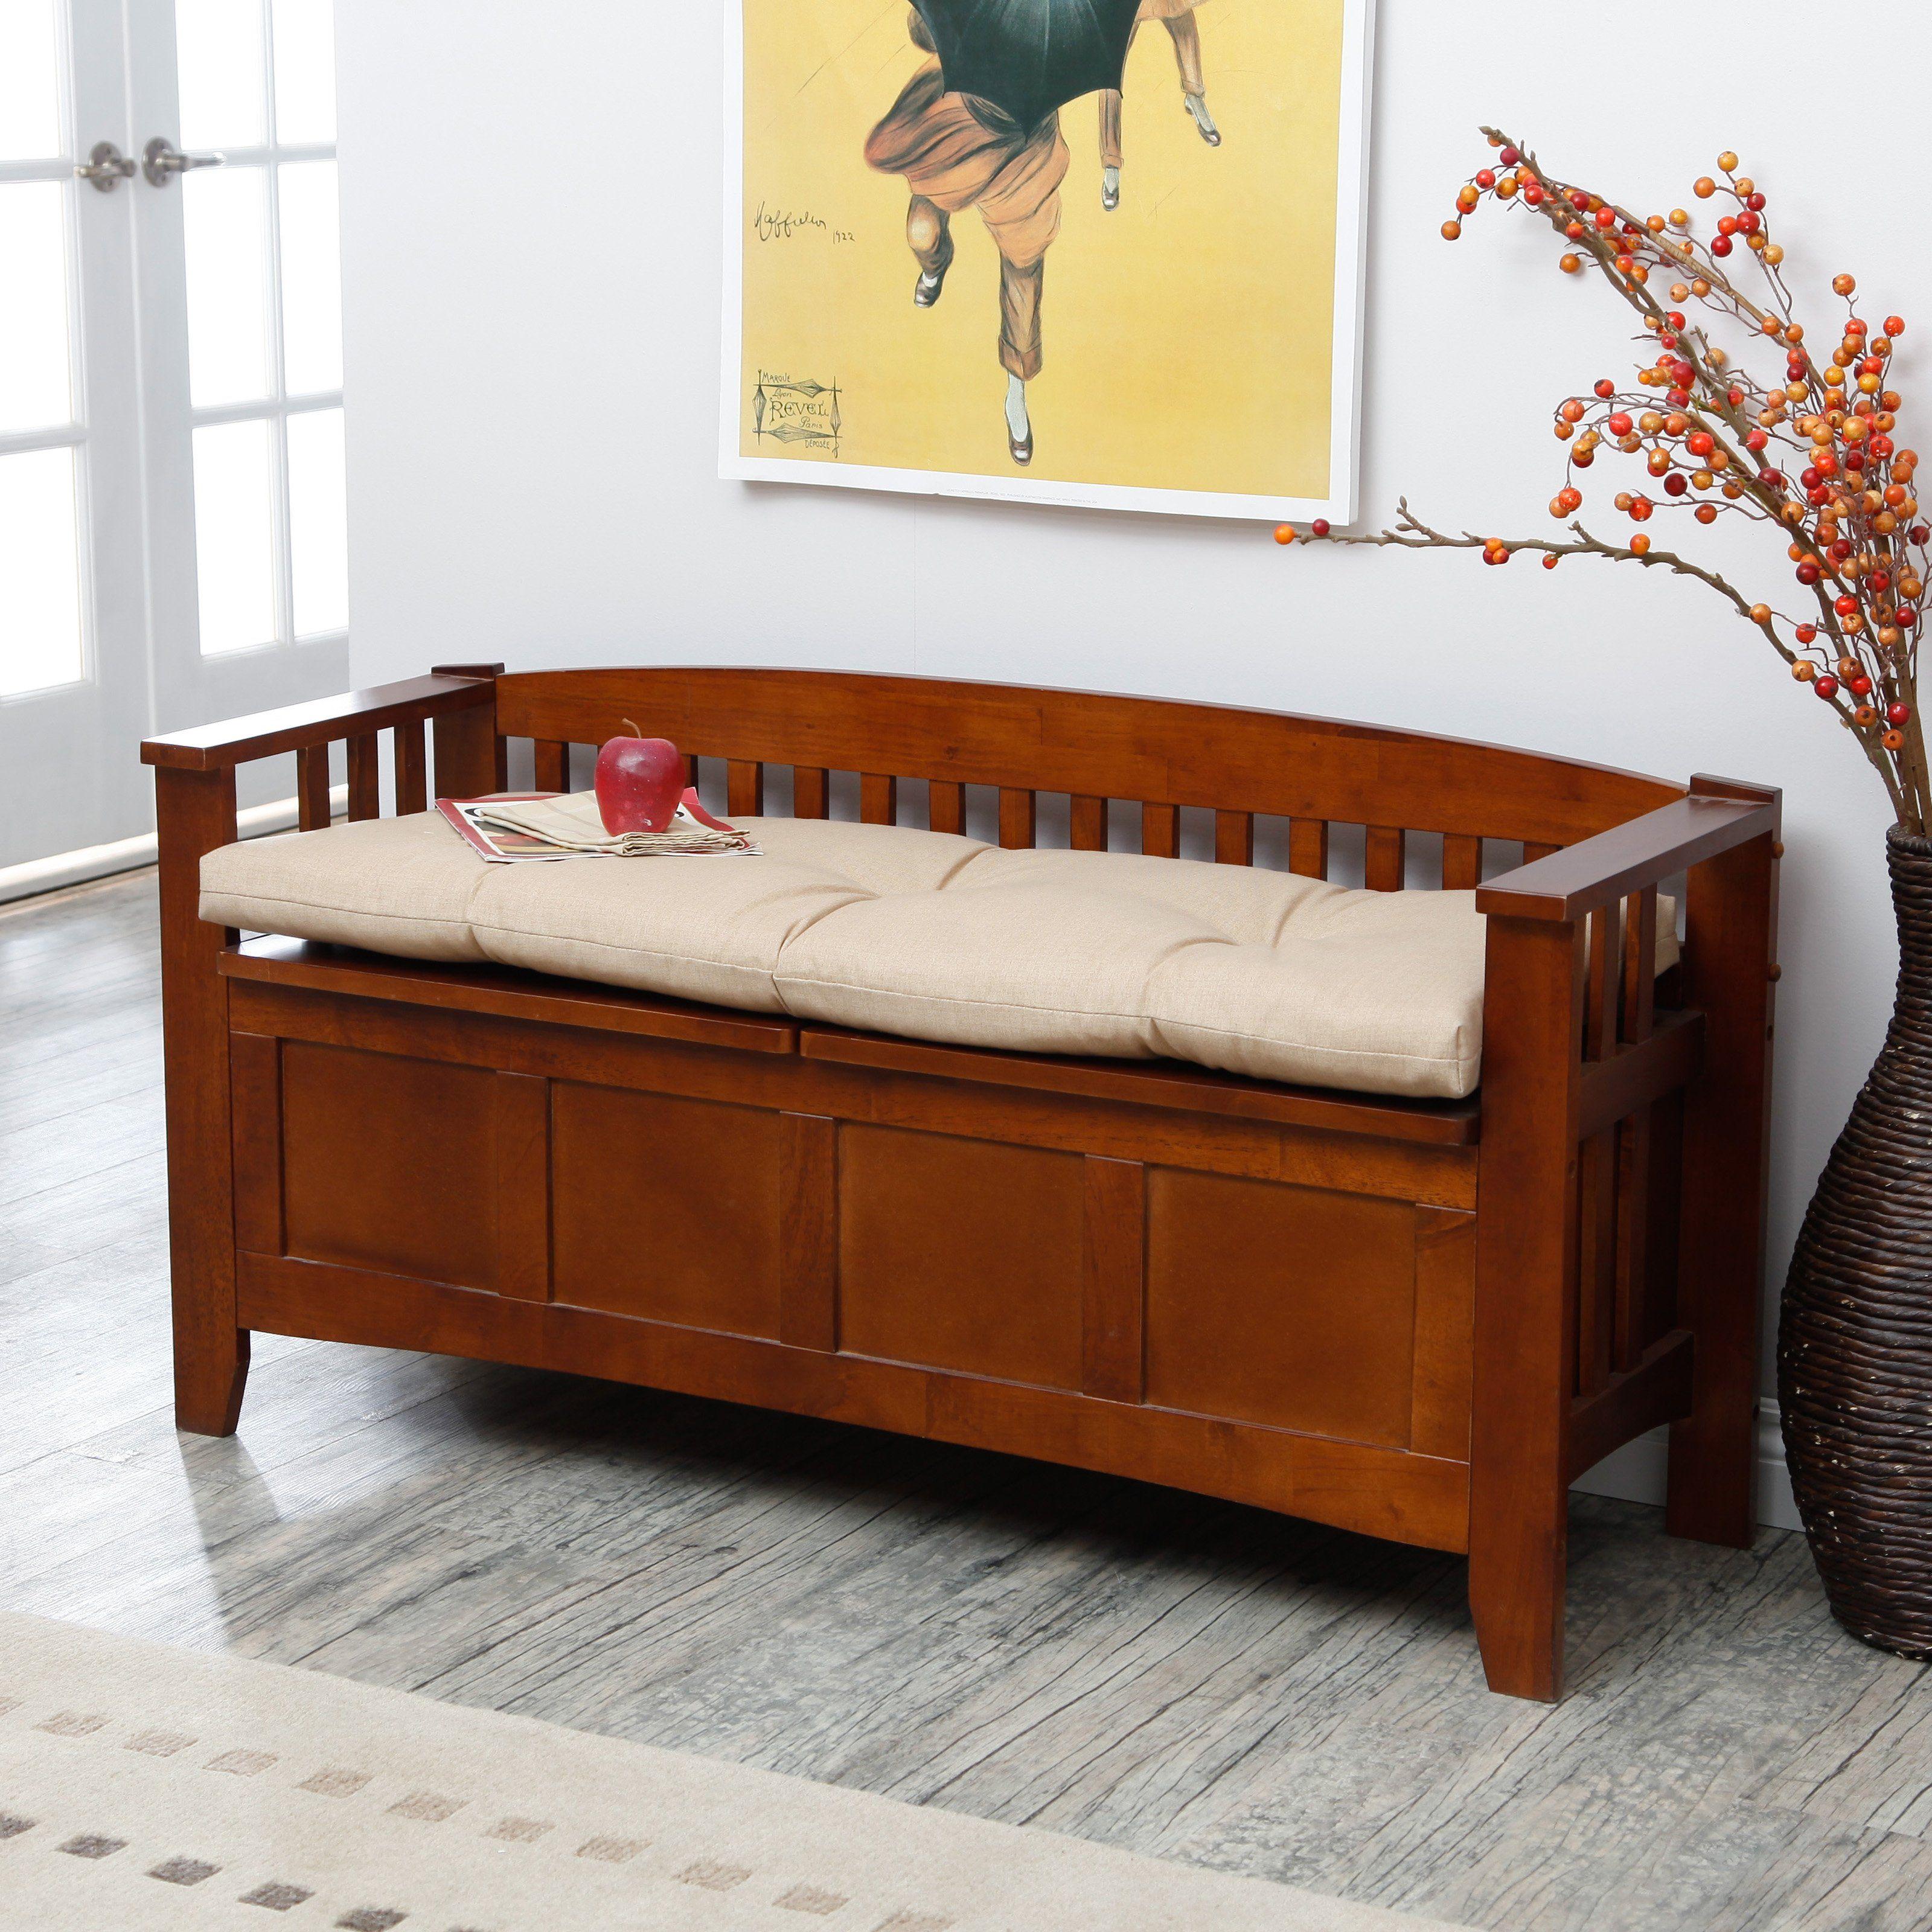 Jordan Manufacturing Storage Bench Cushion 45l X 16w X 2h In